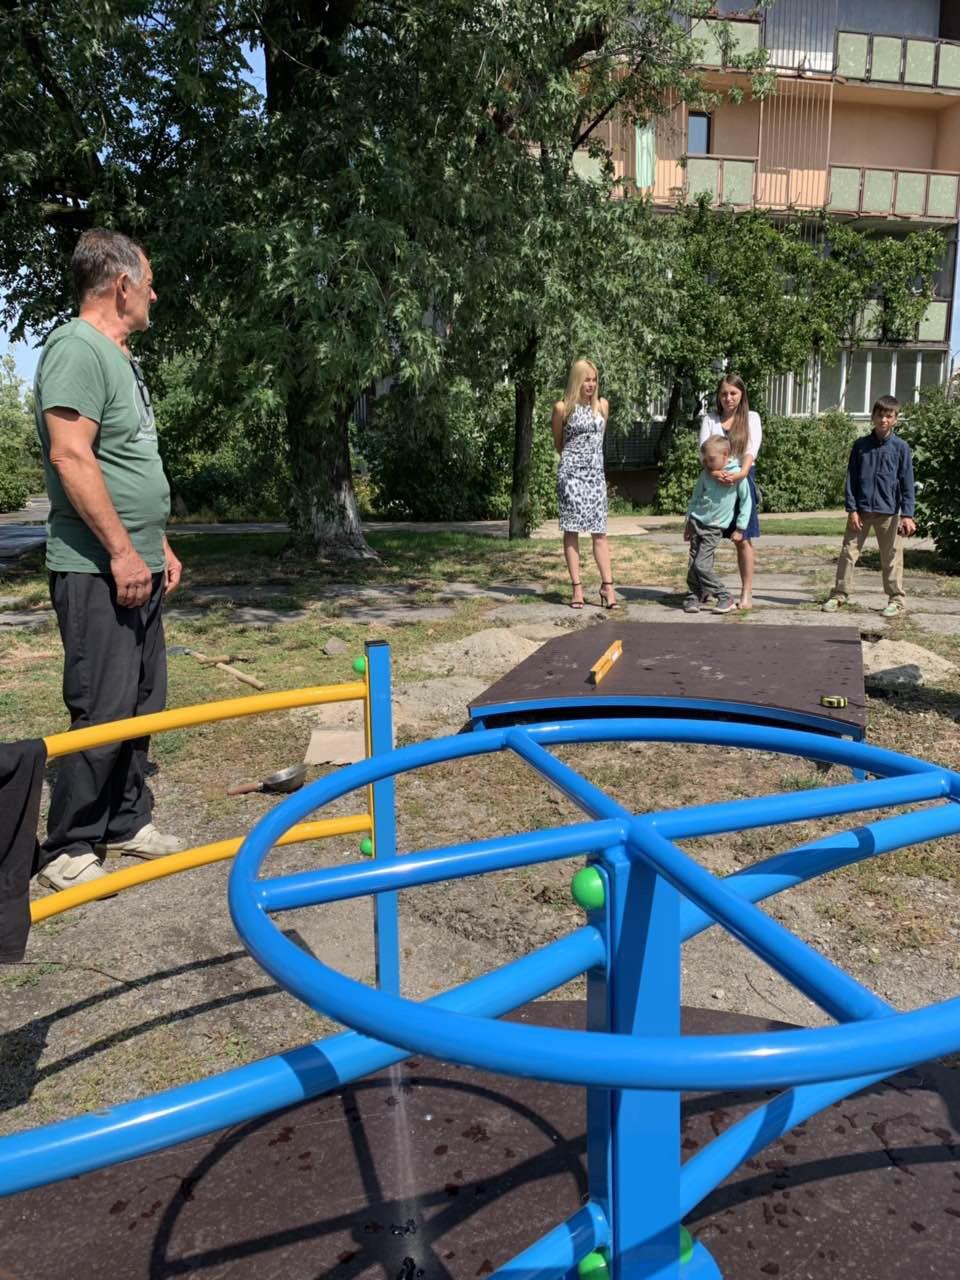 В Українку приїхало обладнання для інклюзивного майданчику -  - FD708EE4 584B 411A A06E 4CF661D4C289